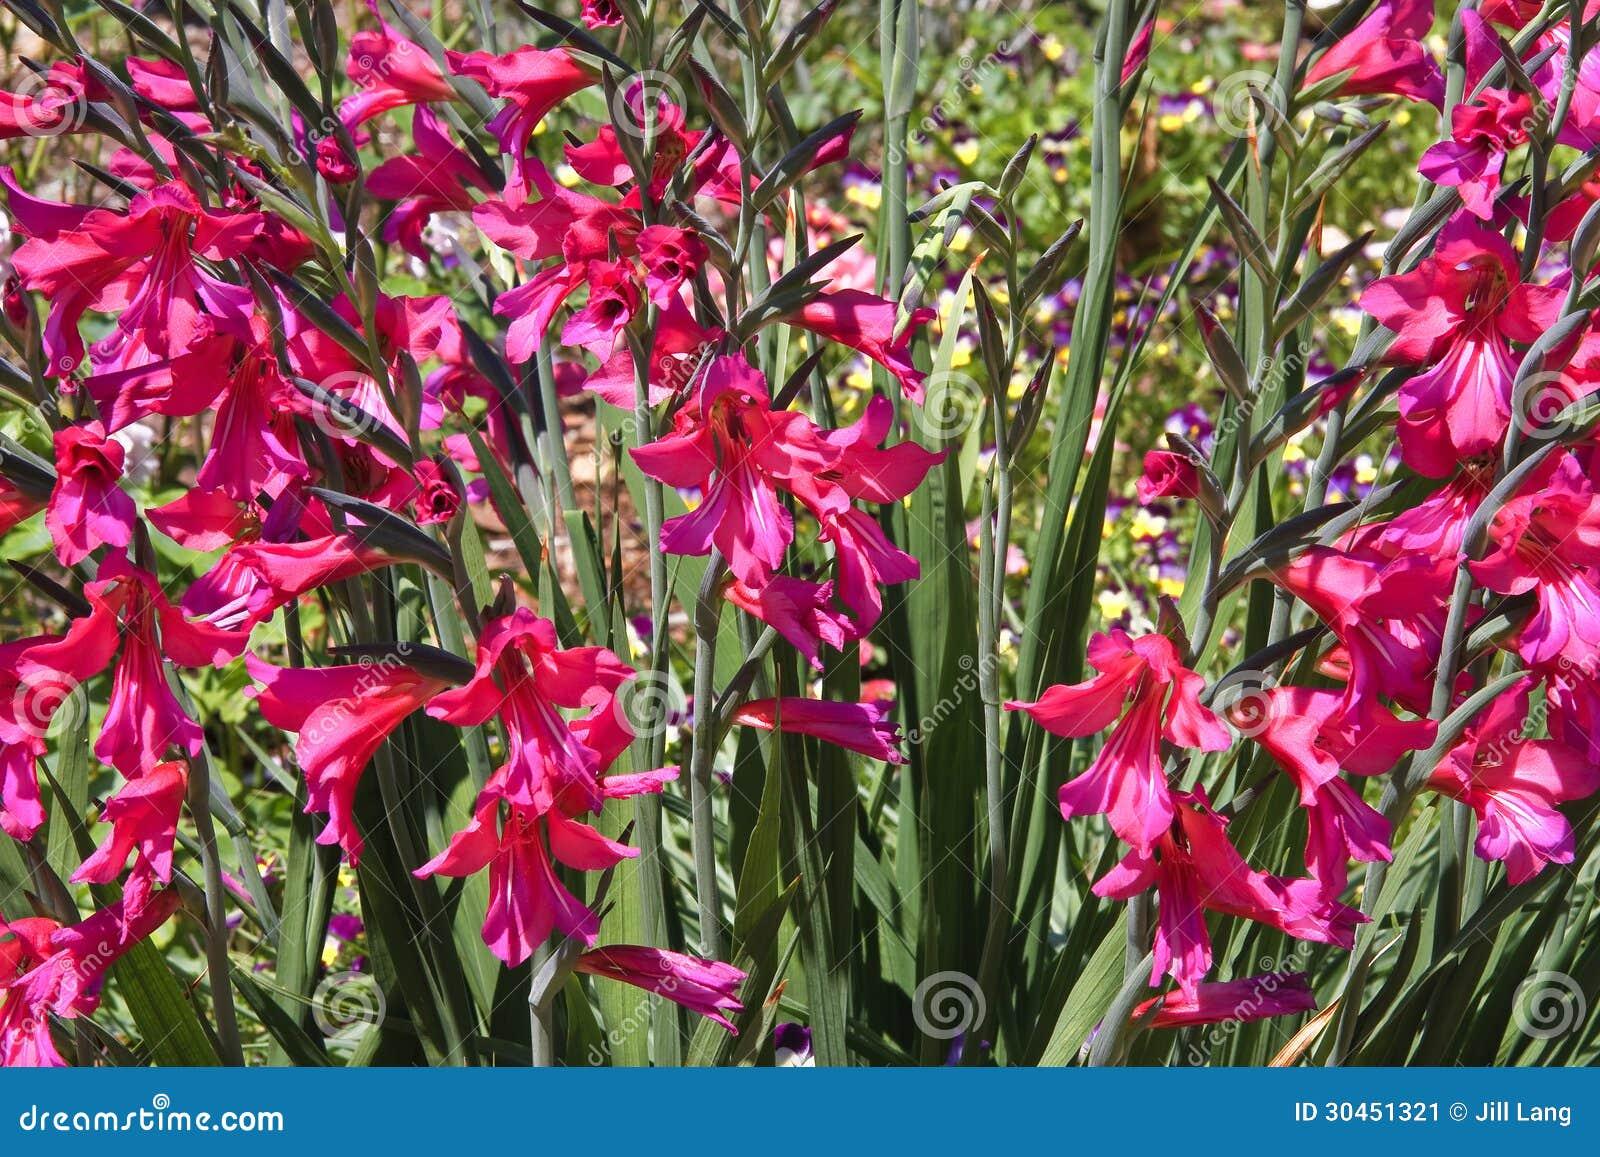 Dark Pink Flowers Stock Image Image Of Gardens Flower 30451321